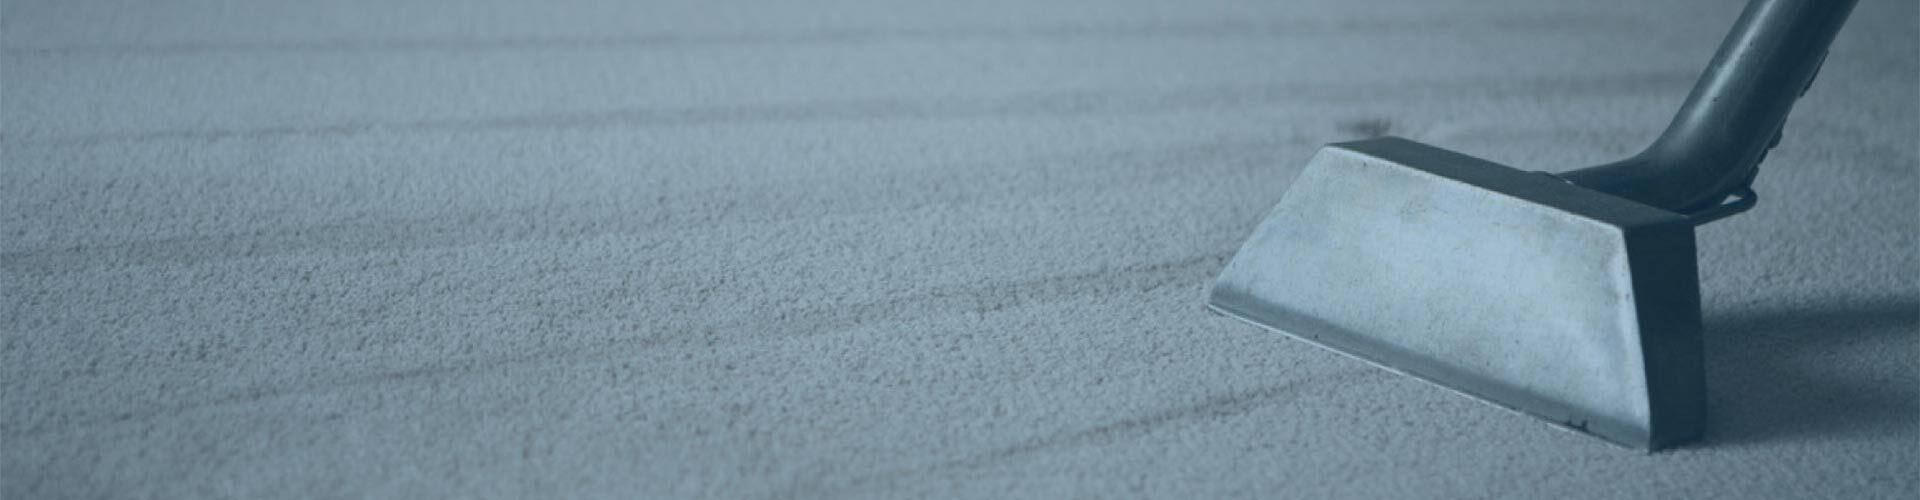 winnipeg-carpet-cleaning-company